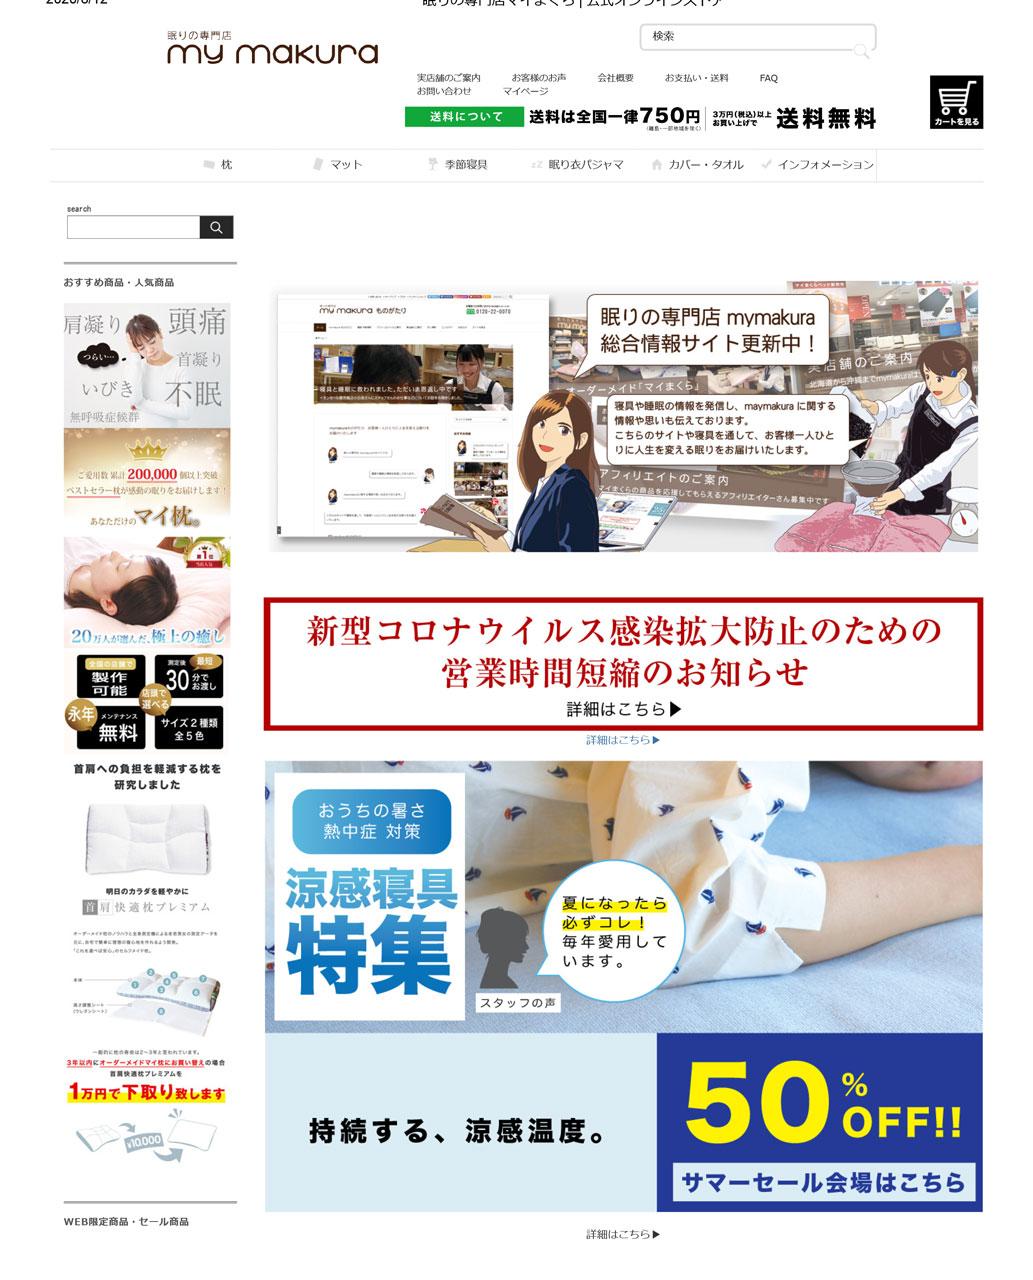 mymakura.com